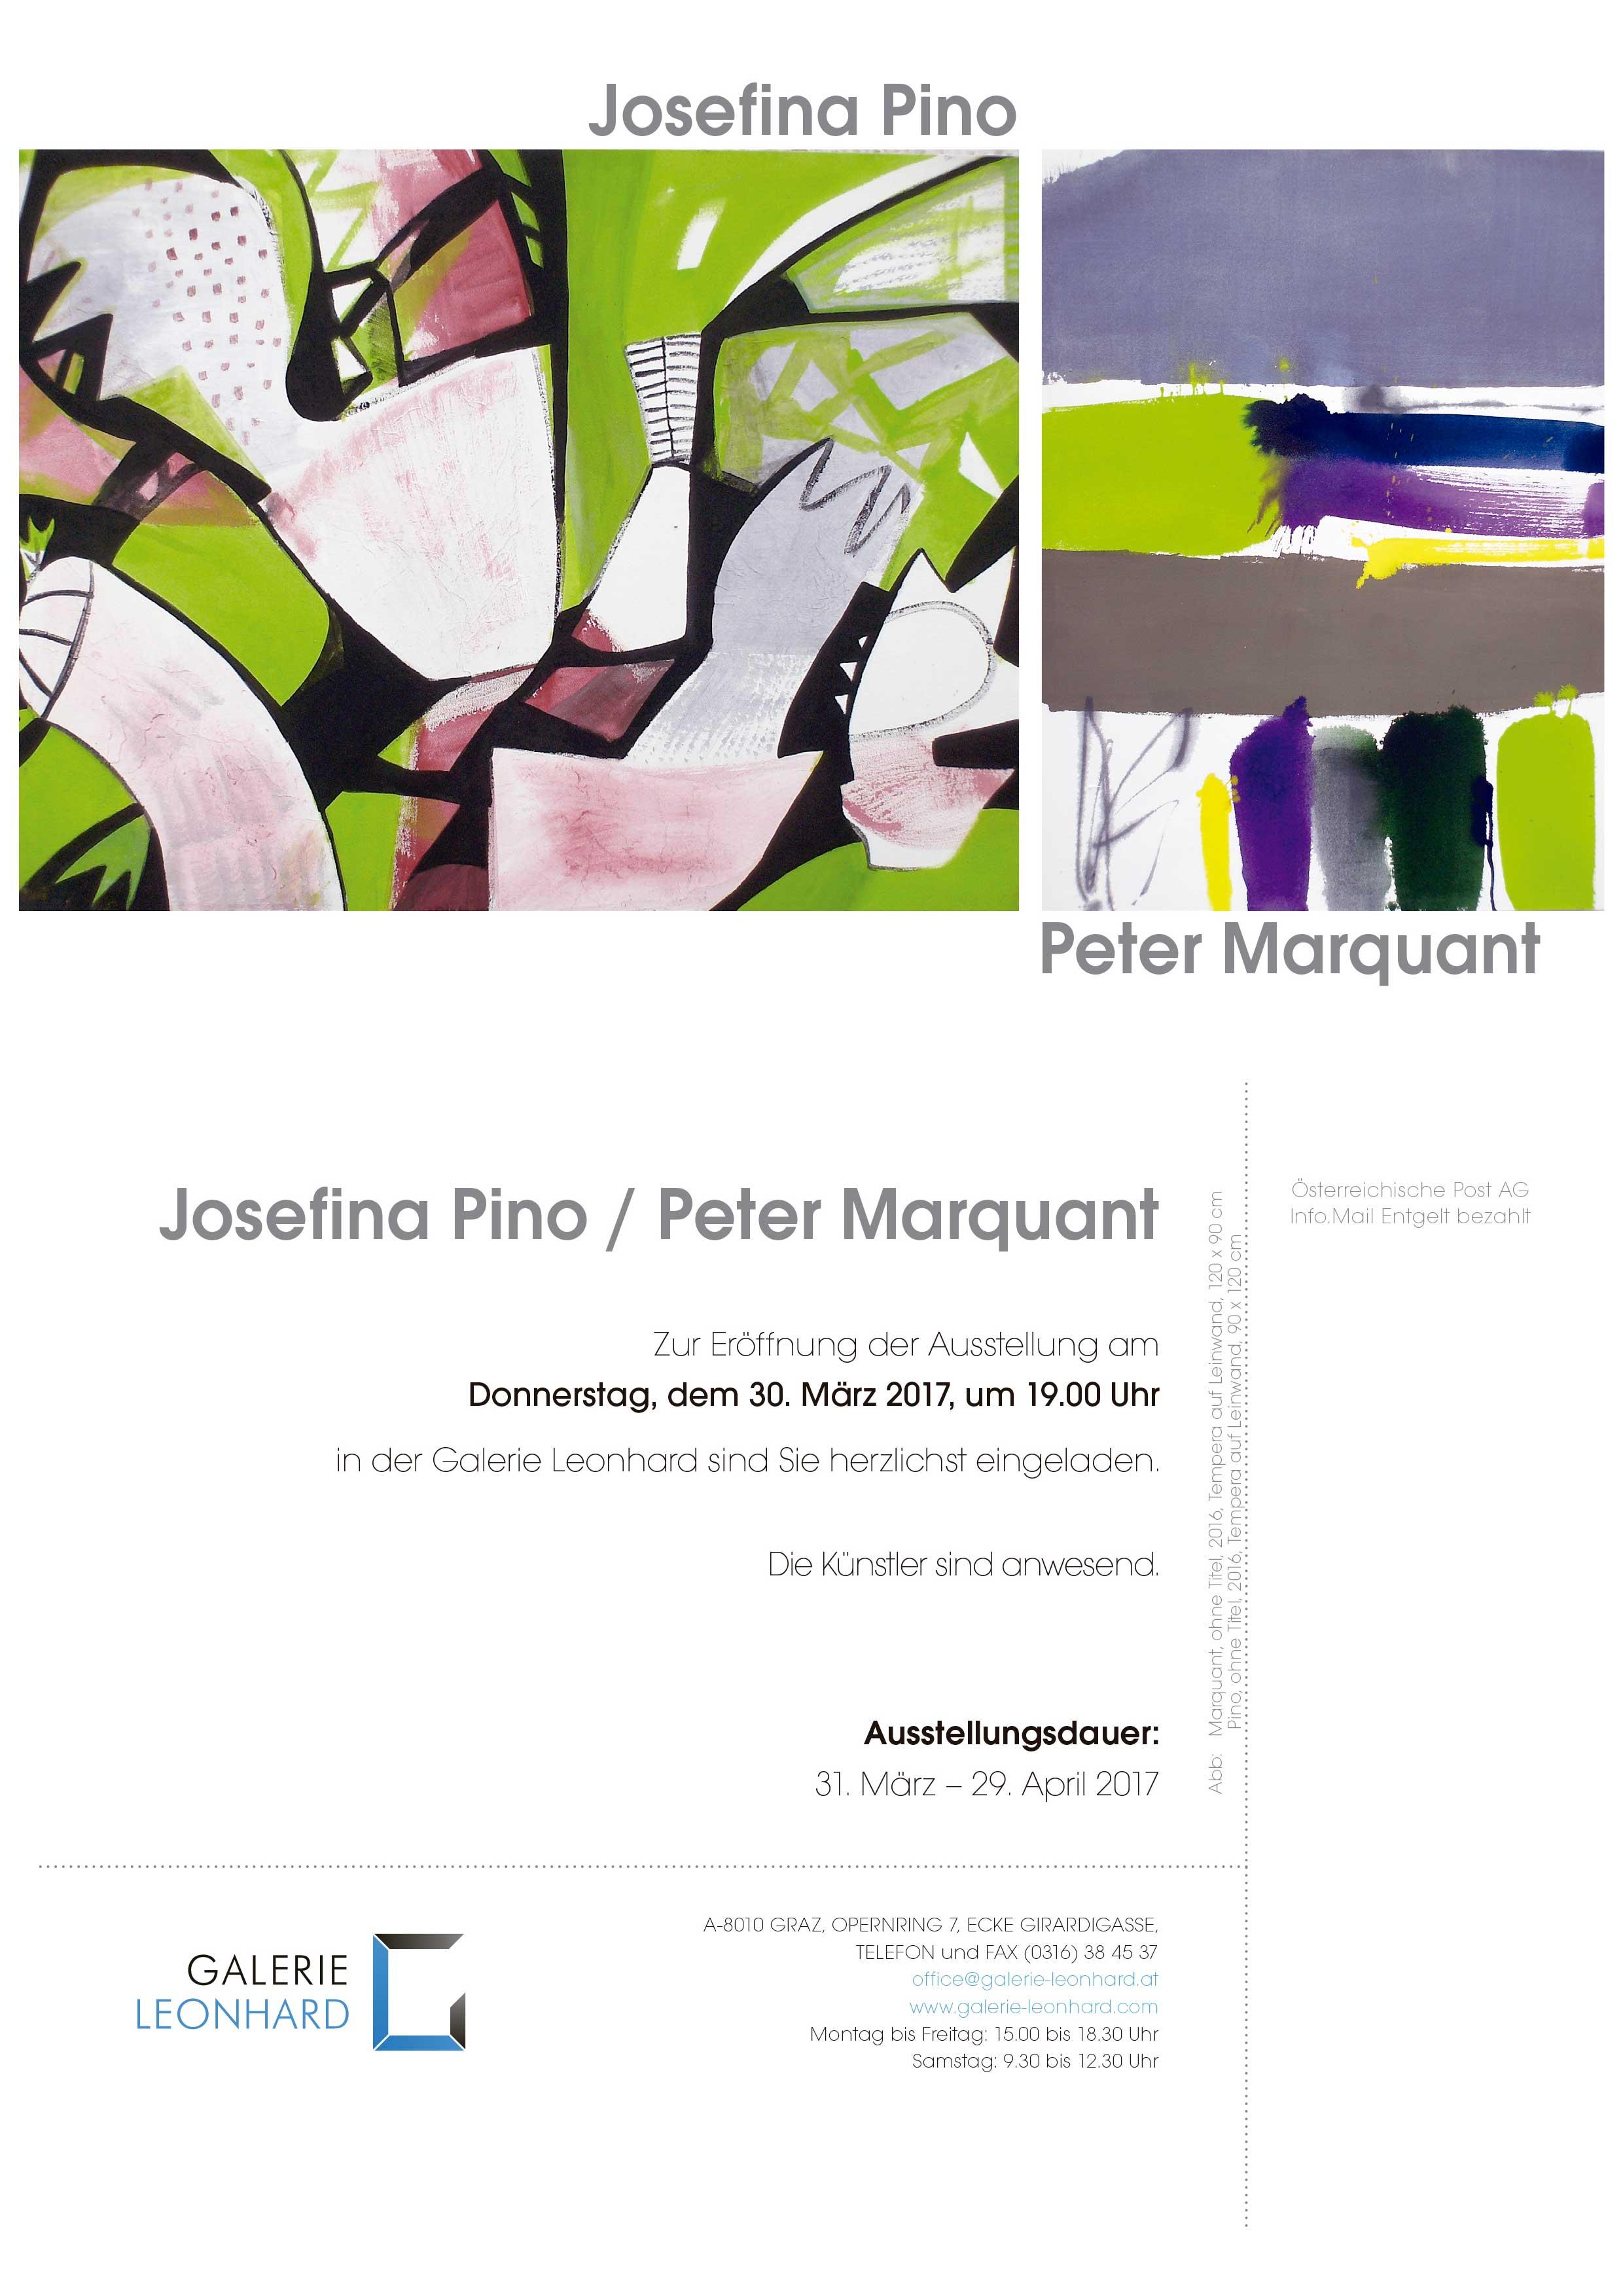 Exposición Josefina Pino-Peter Marquant- Galerie Leonhard-Graz